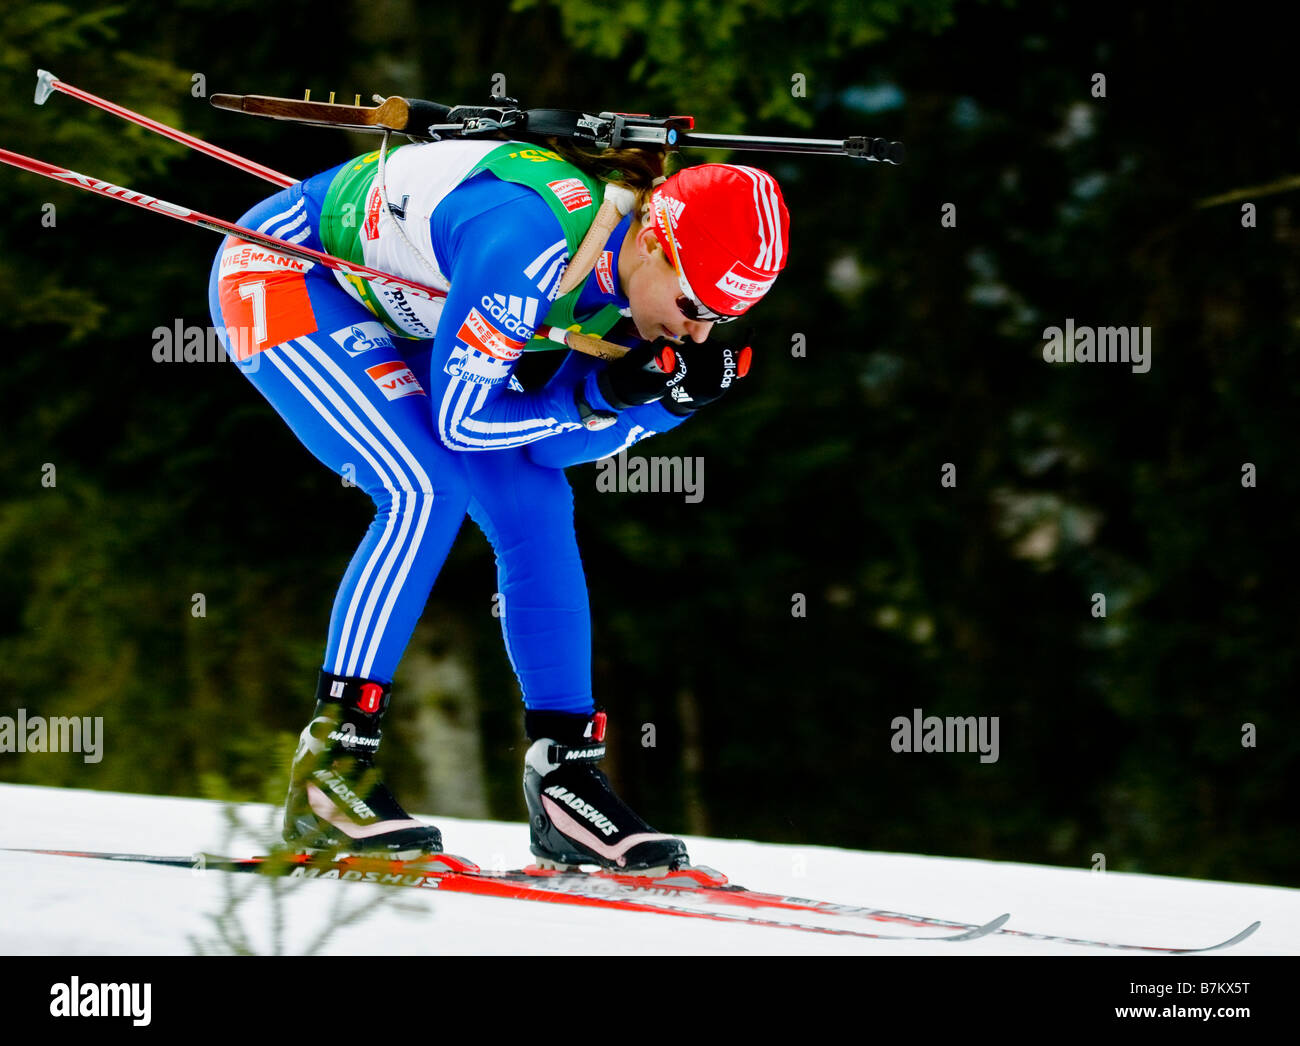 IOURIEVA Ekaterina Russland Biathlon Weltcup Verfolgung Frauen M nner Ruhpolding 18 1 2009 - Stock Image